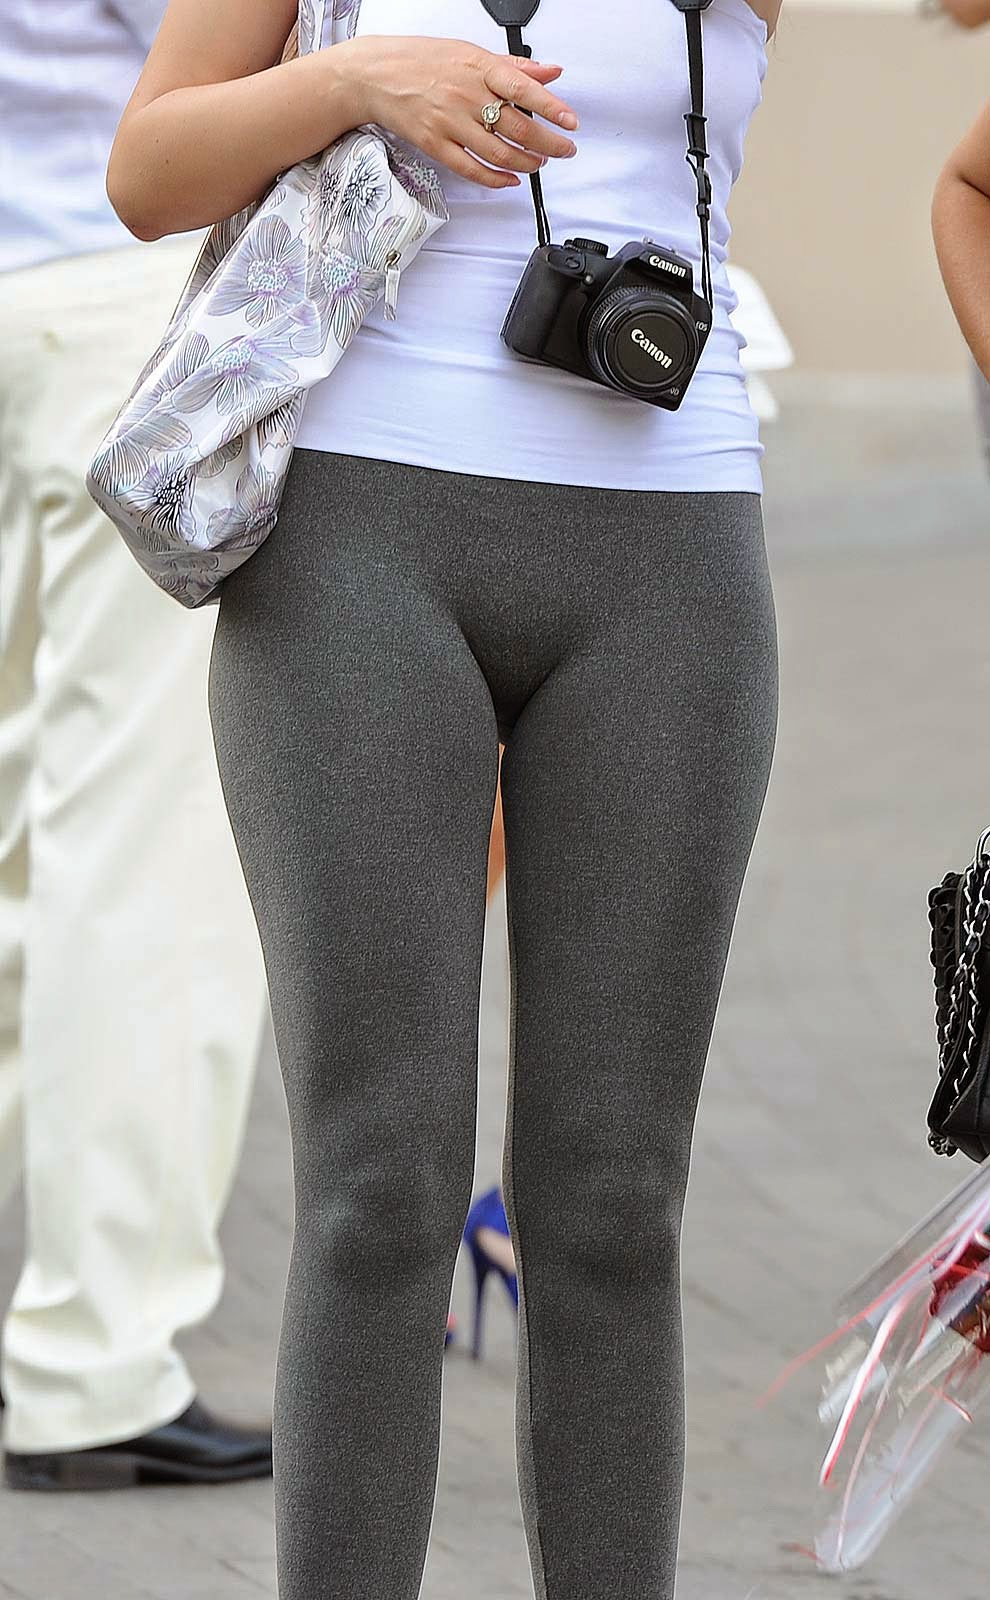 Sexy leggings pics